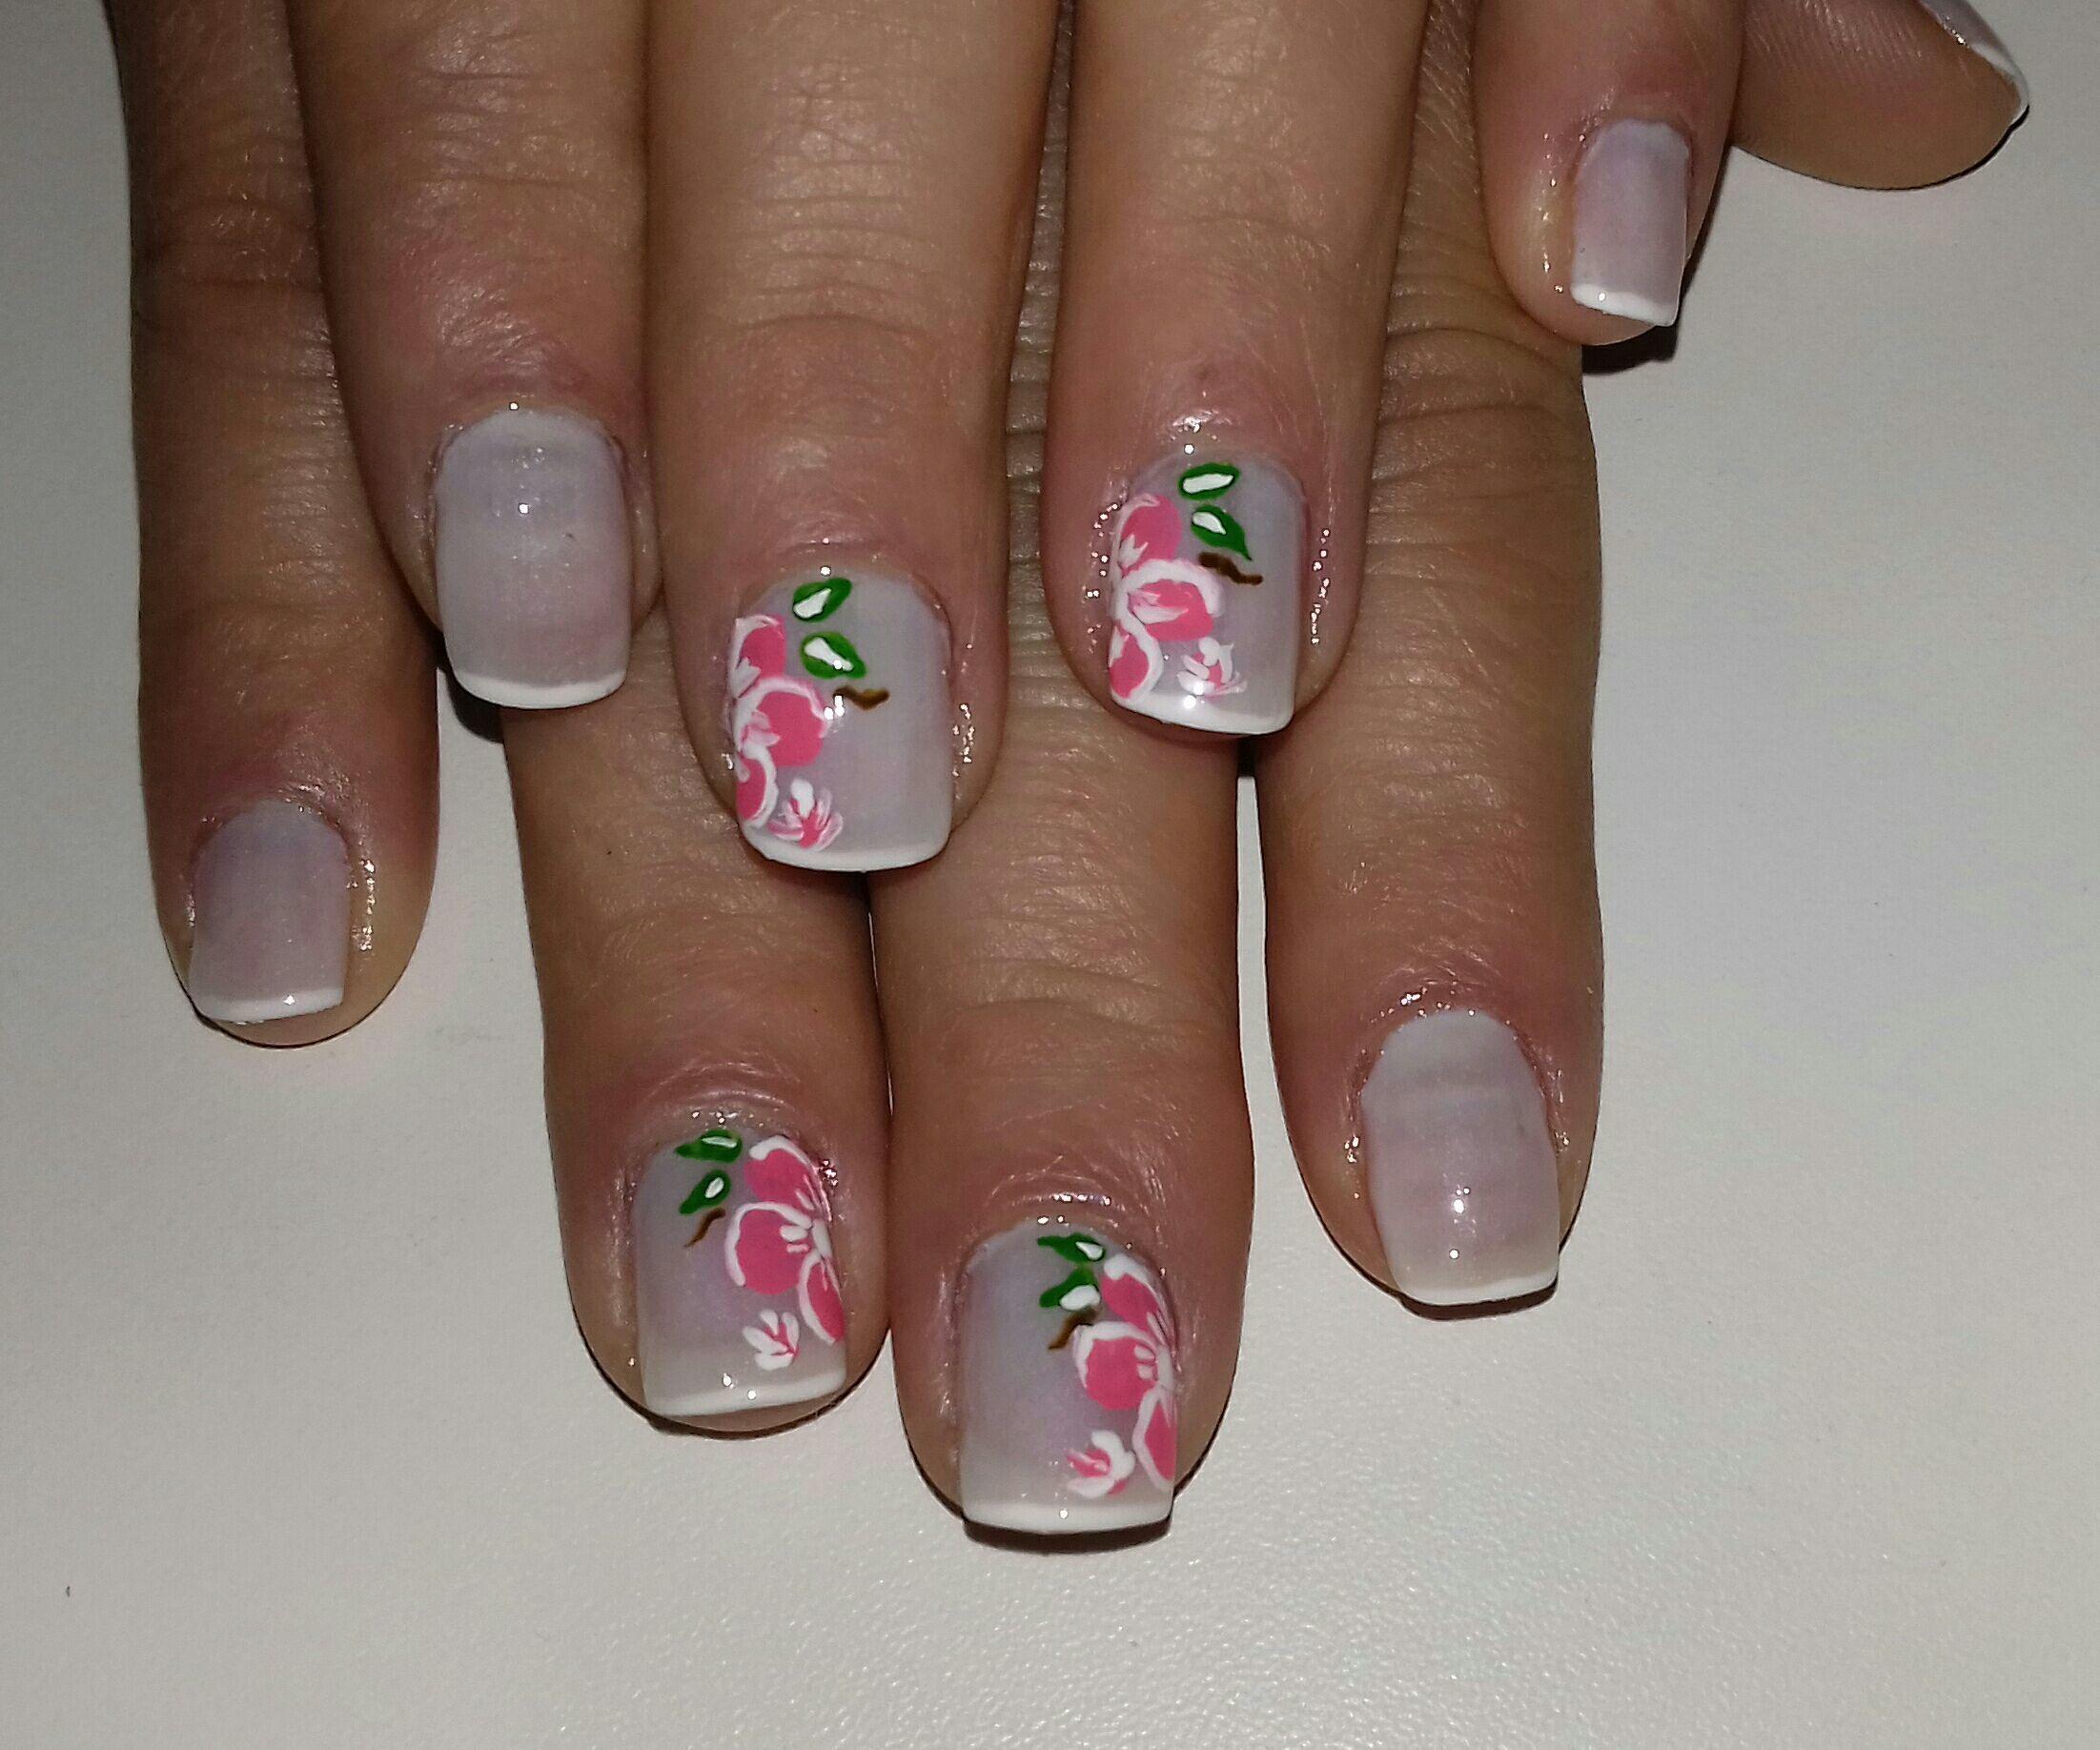 Unhas decoradas artesanalmente! #francesinha unha manicure e pedicure manicure e pedicure